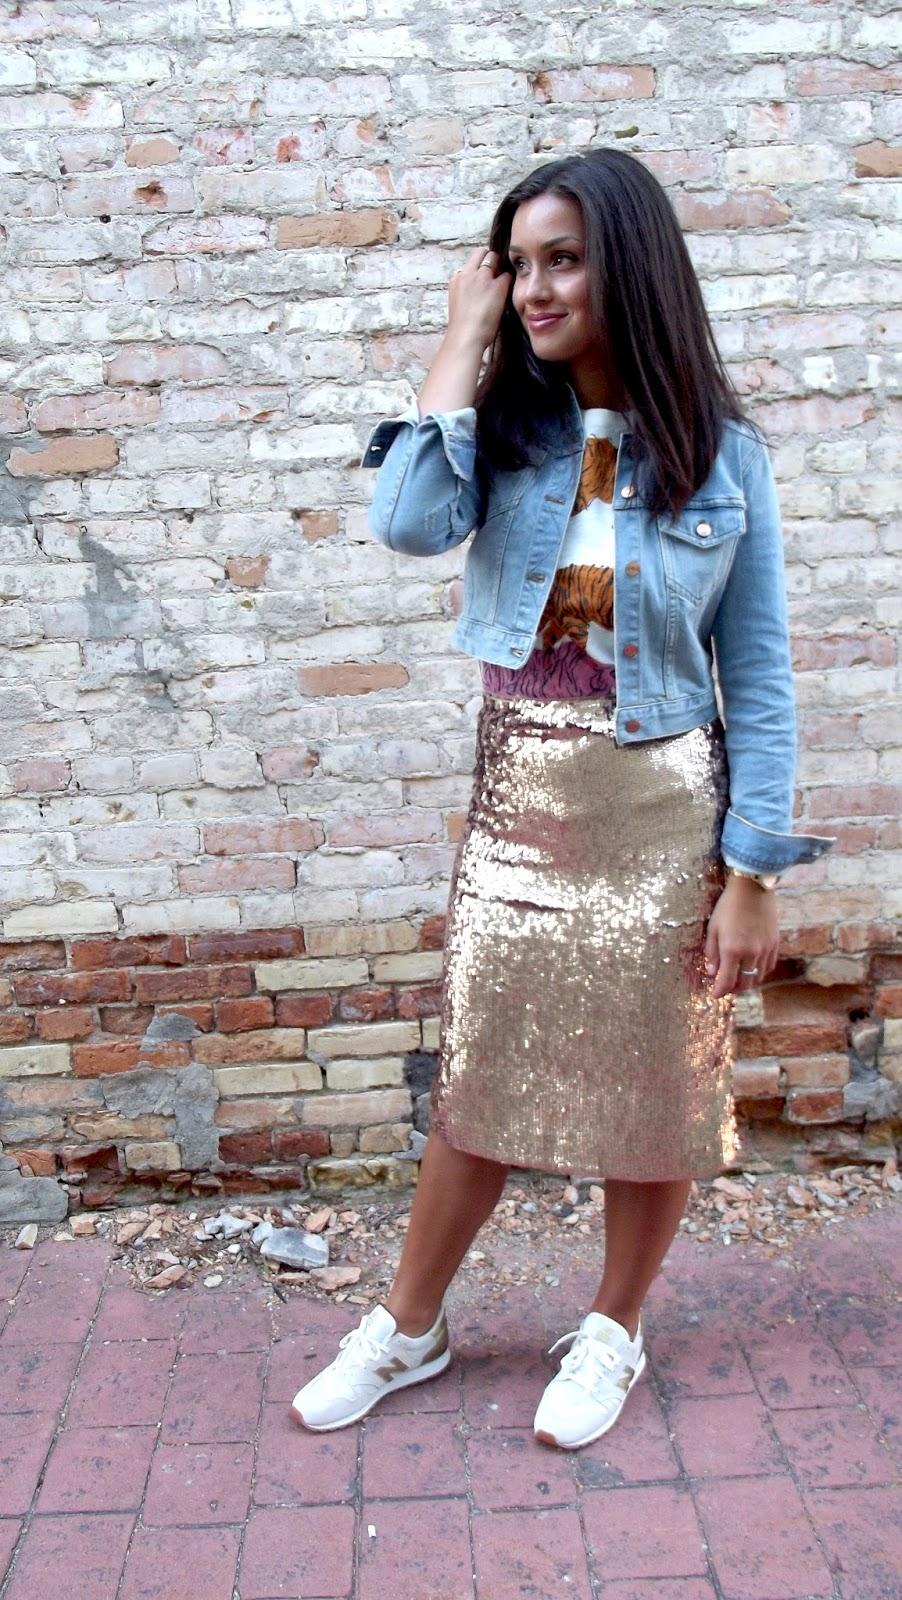 Sequin gold skirt with denim shirt foto